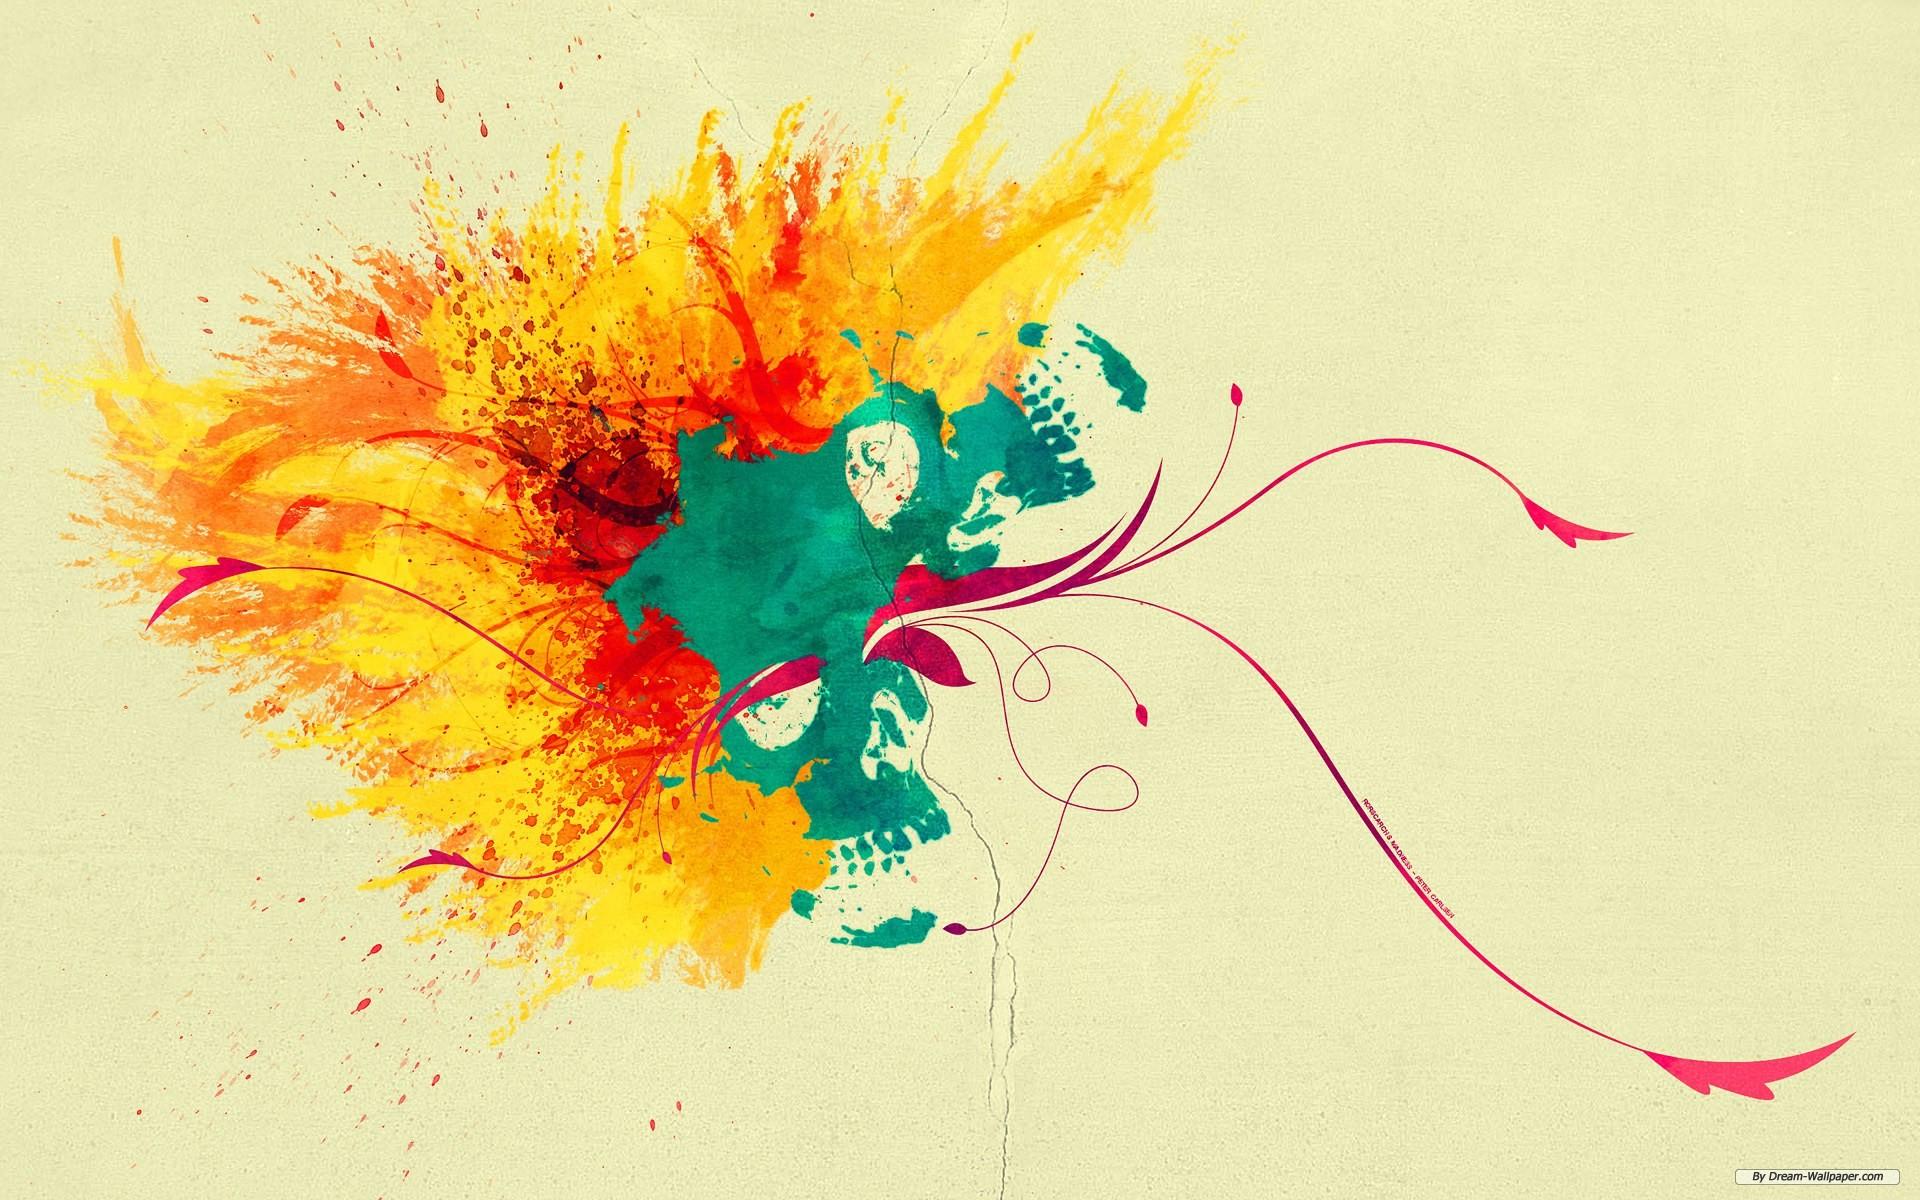 wallpaper desktop wallpapers art desktop 1920x1200 1920x1200